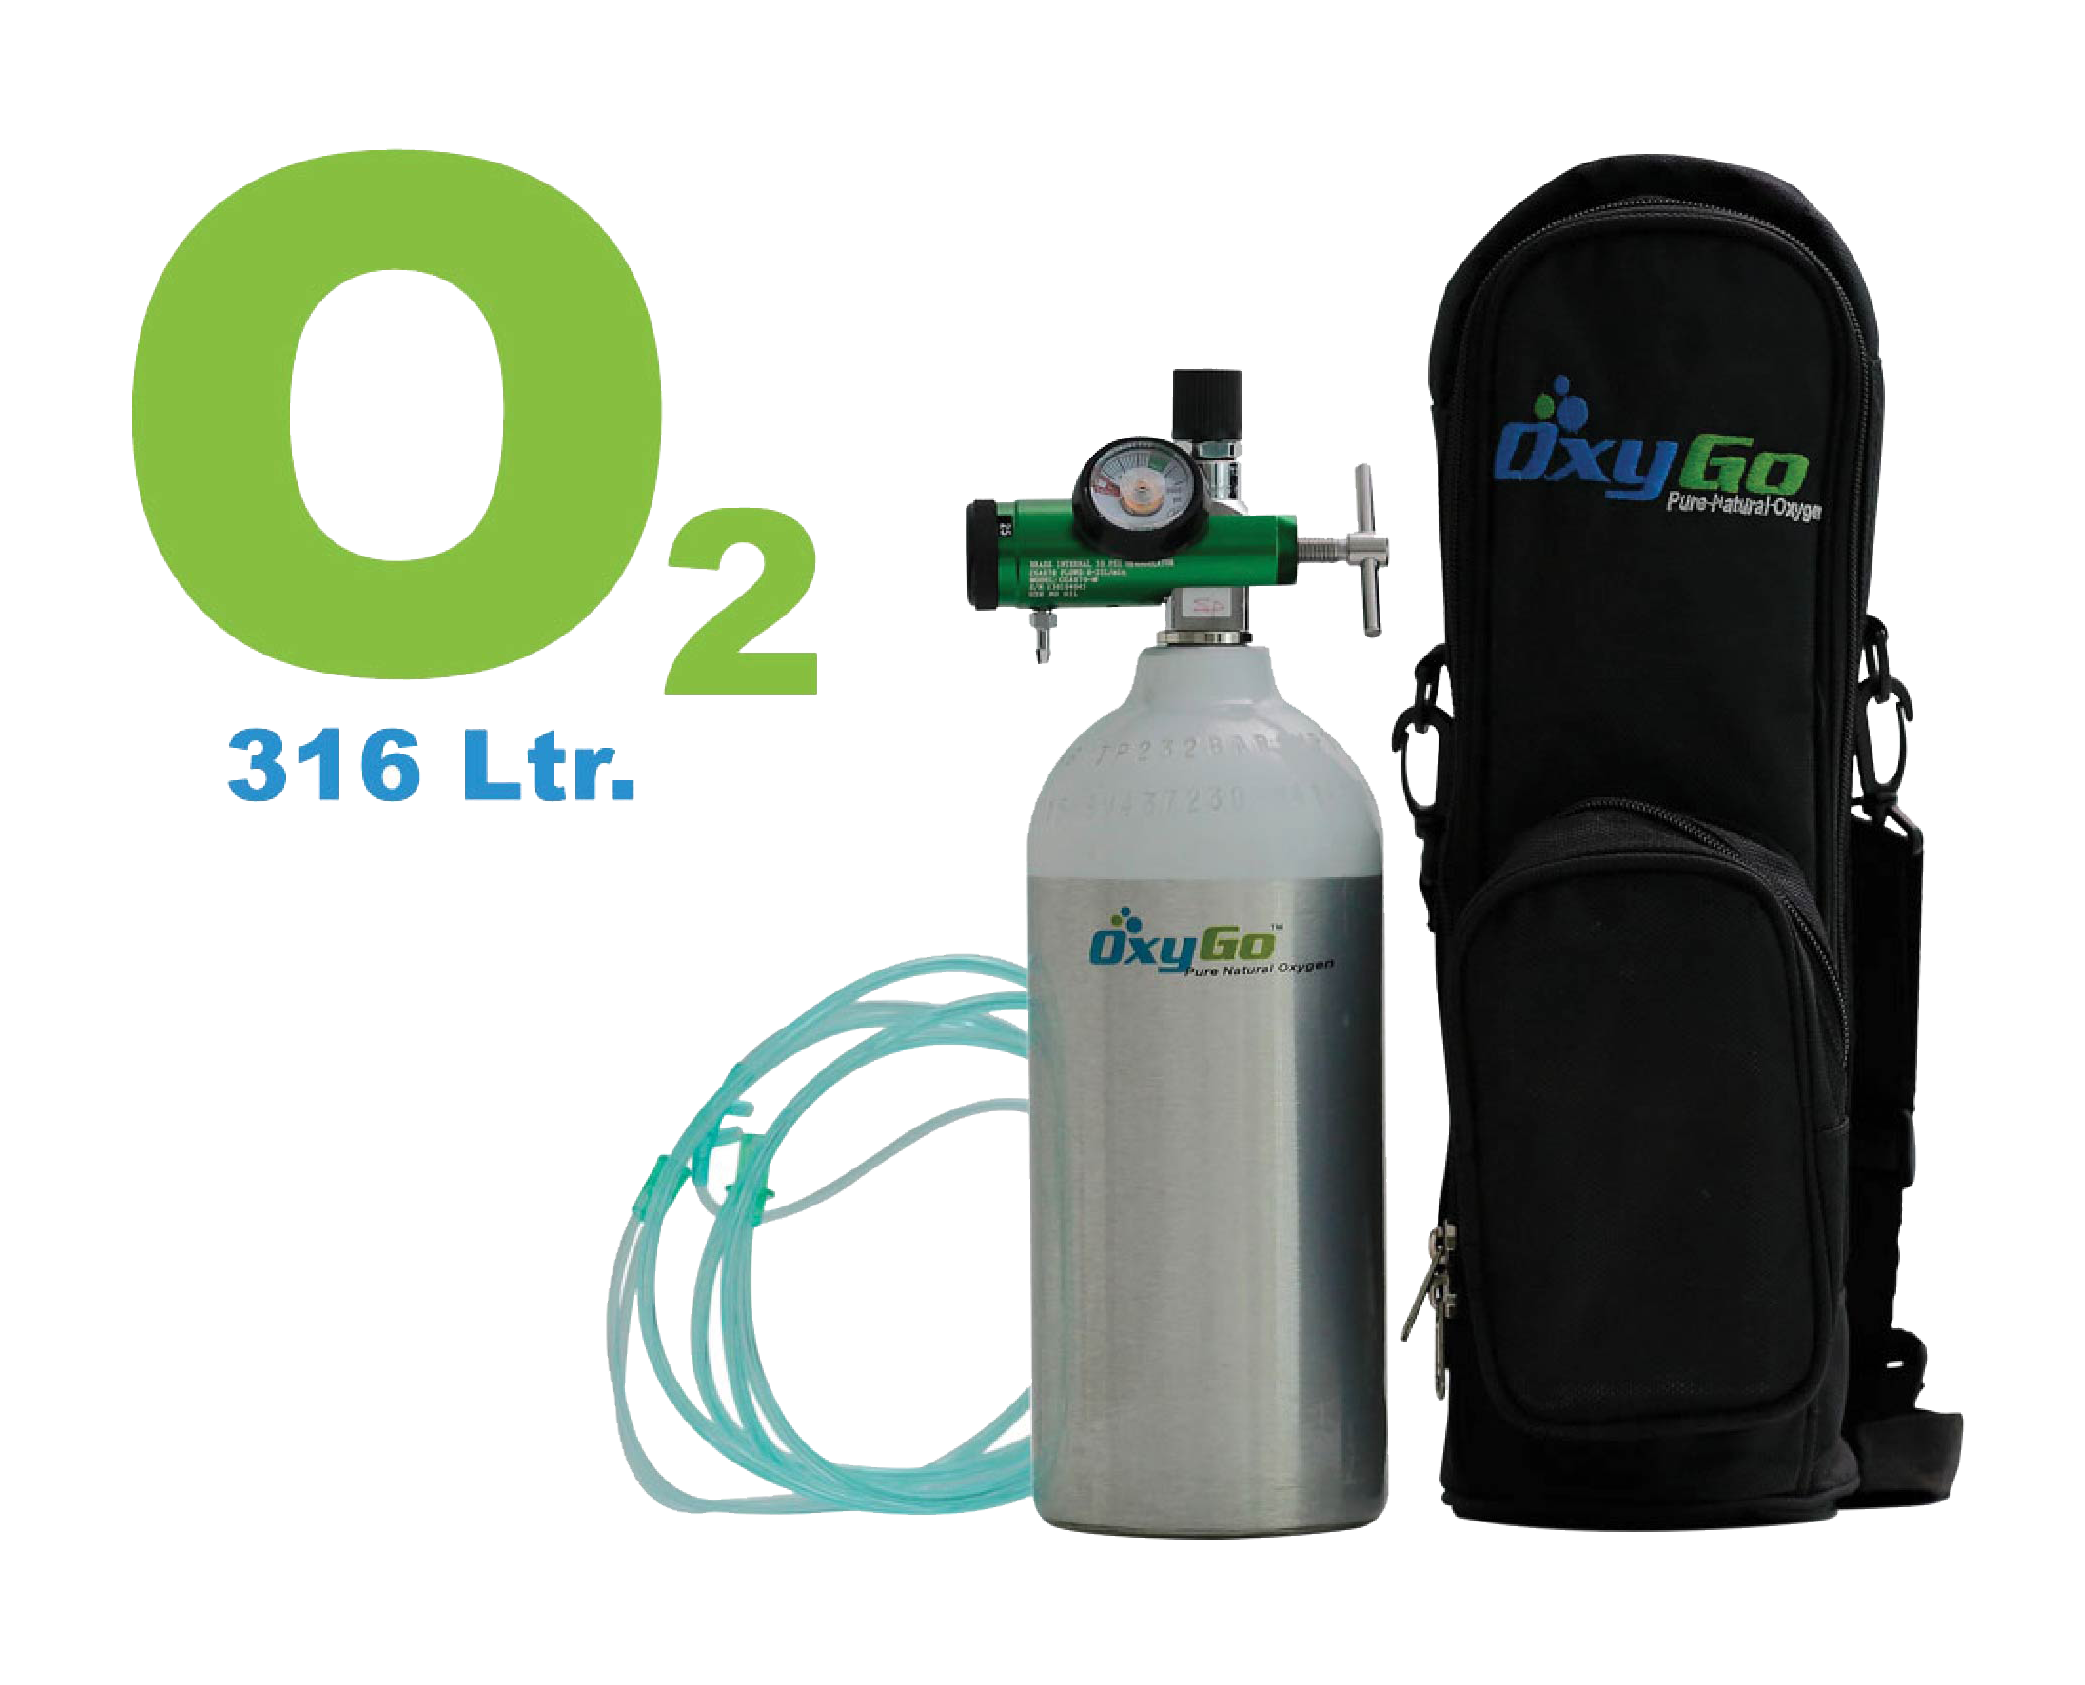 OxyGo Oxygen Cylinders